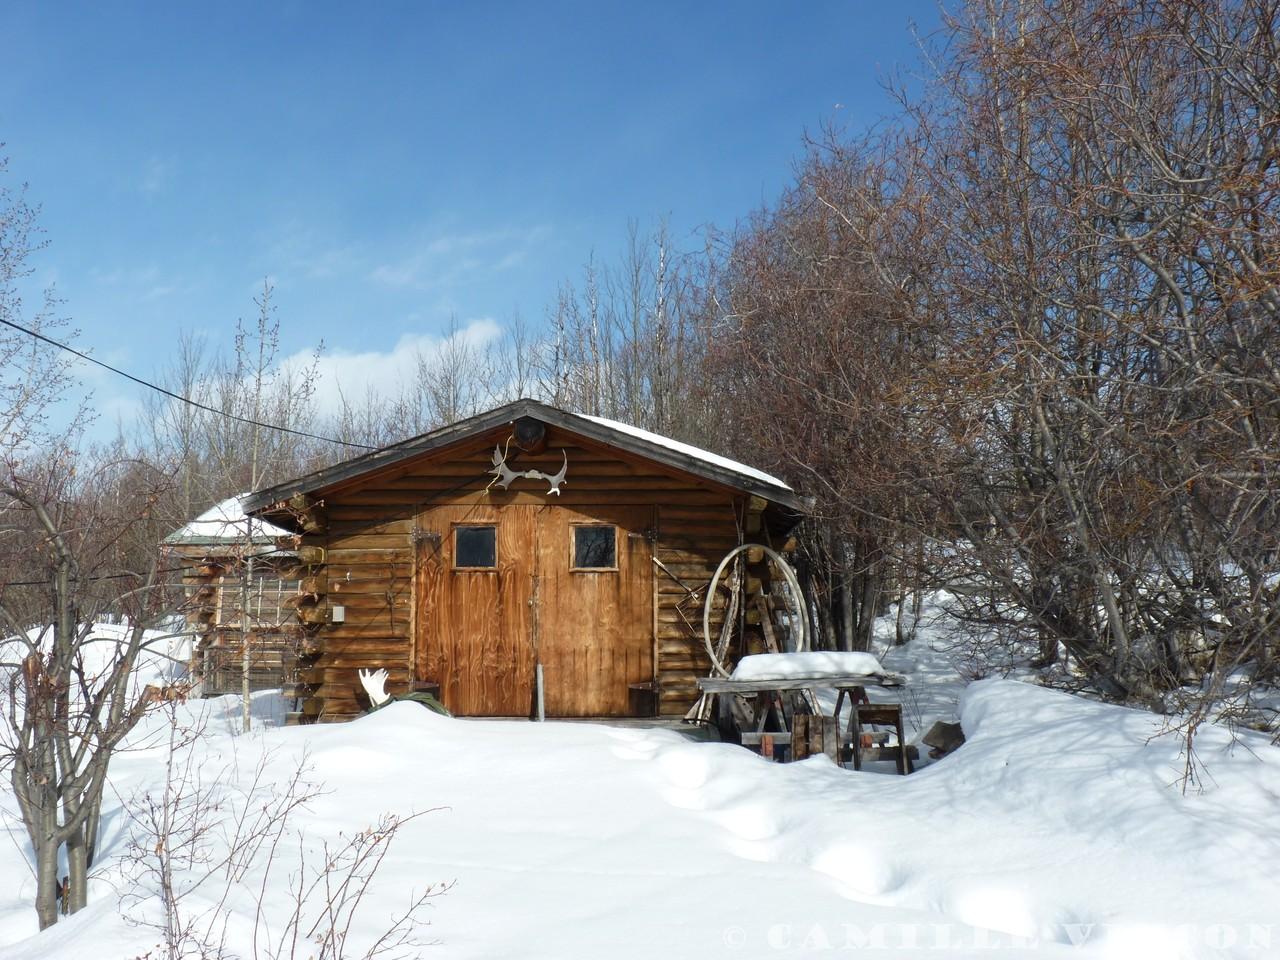 Les cabanes typiques en rondins dans les territoires du nord du Canada et de l'Alaska.